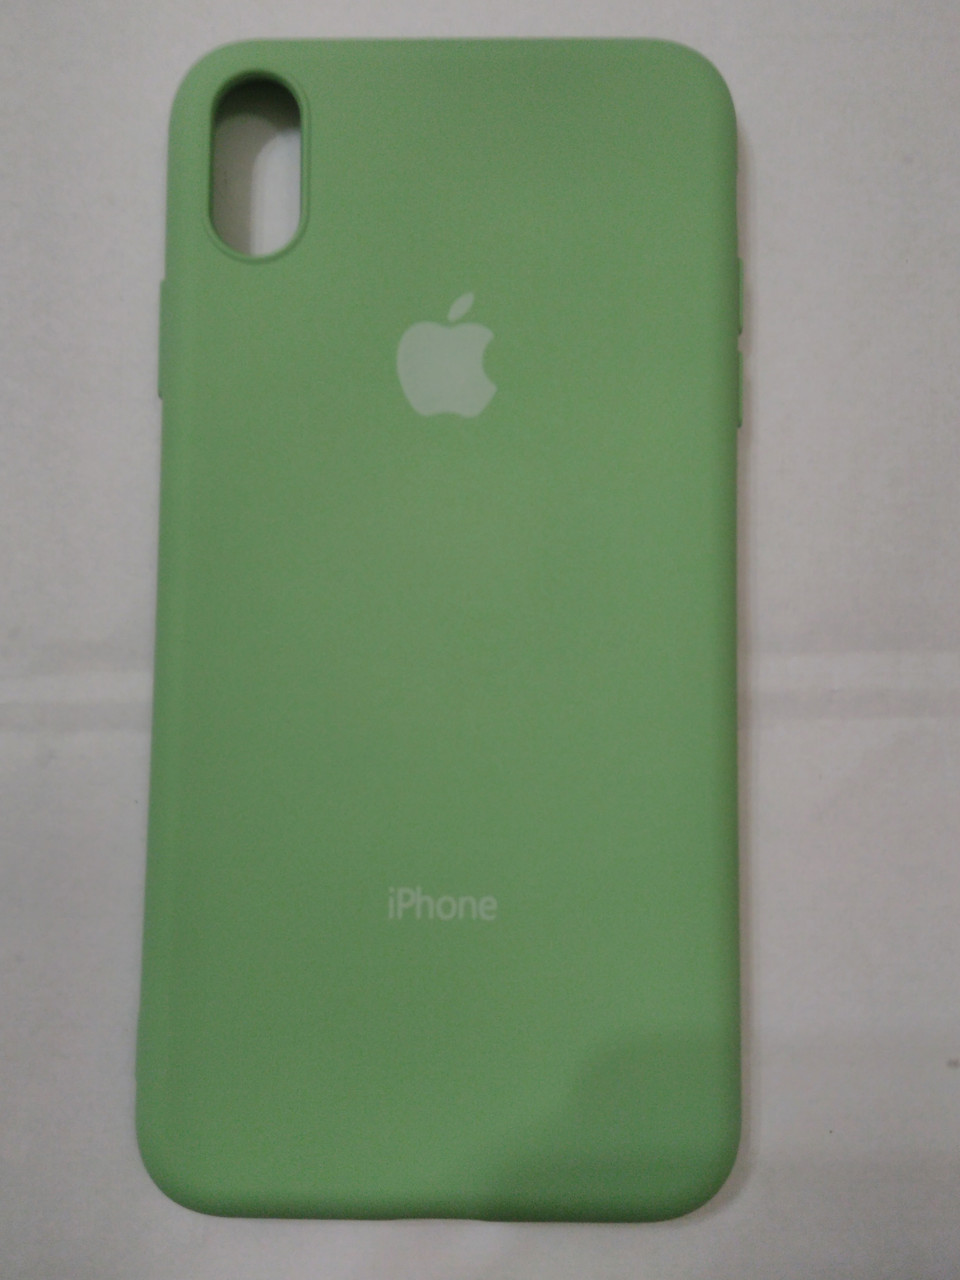 Накладка   Silicon Cover full   для  iPhone  XS  MAX 6.5  (мятный)